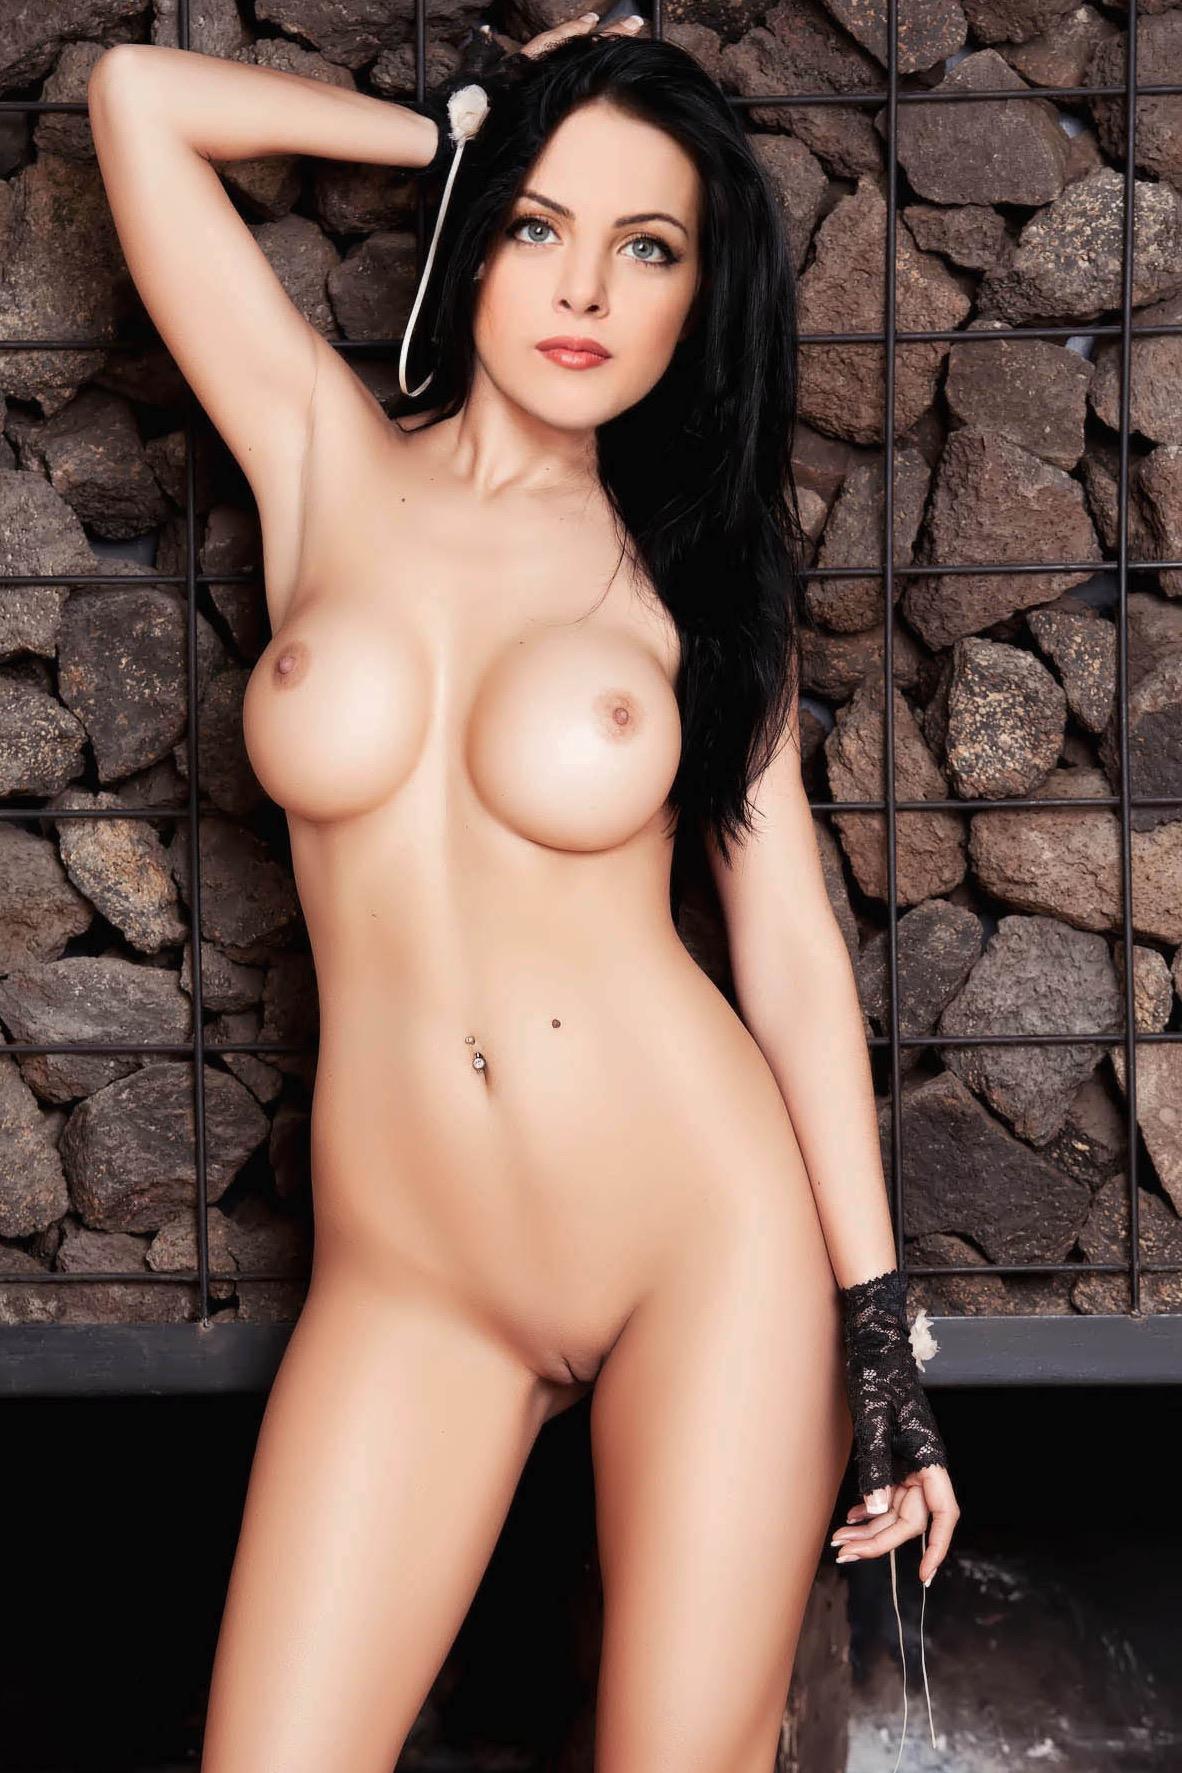 Big celebrity tits